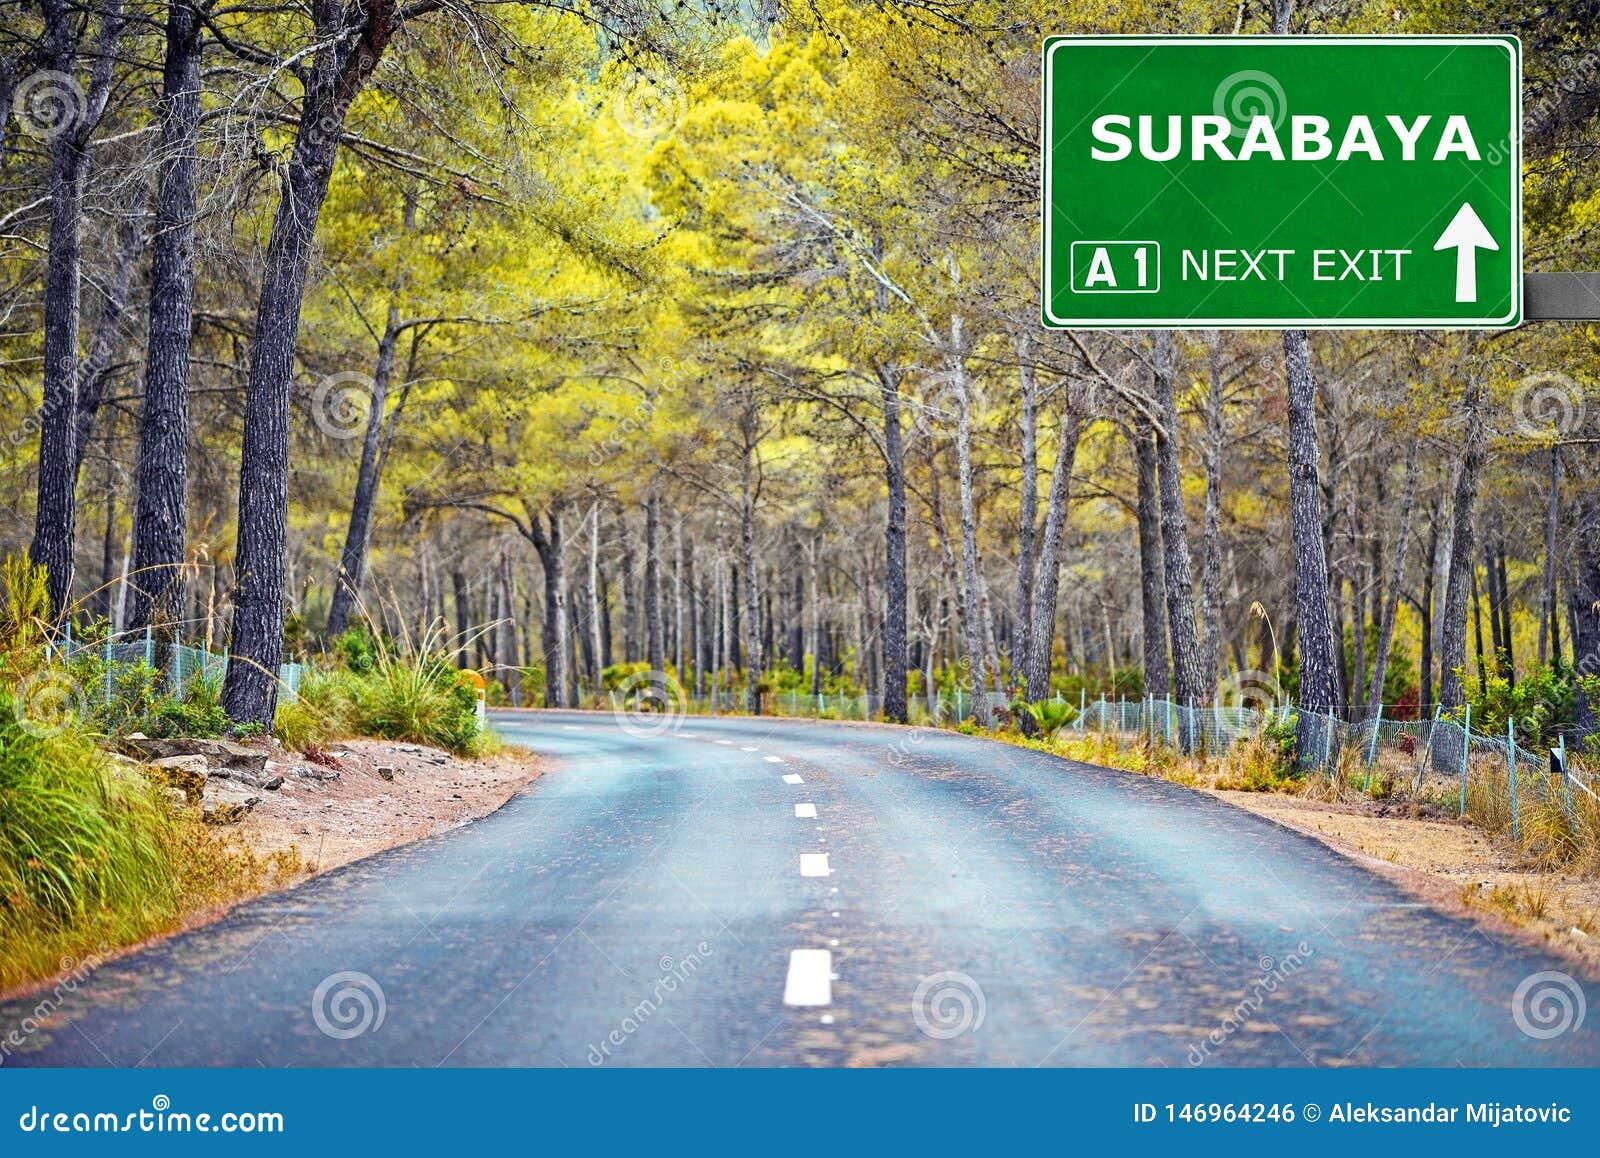 SURABAYA-Verkehrsschild gegen klaren blauen Himmel